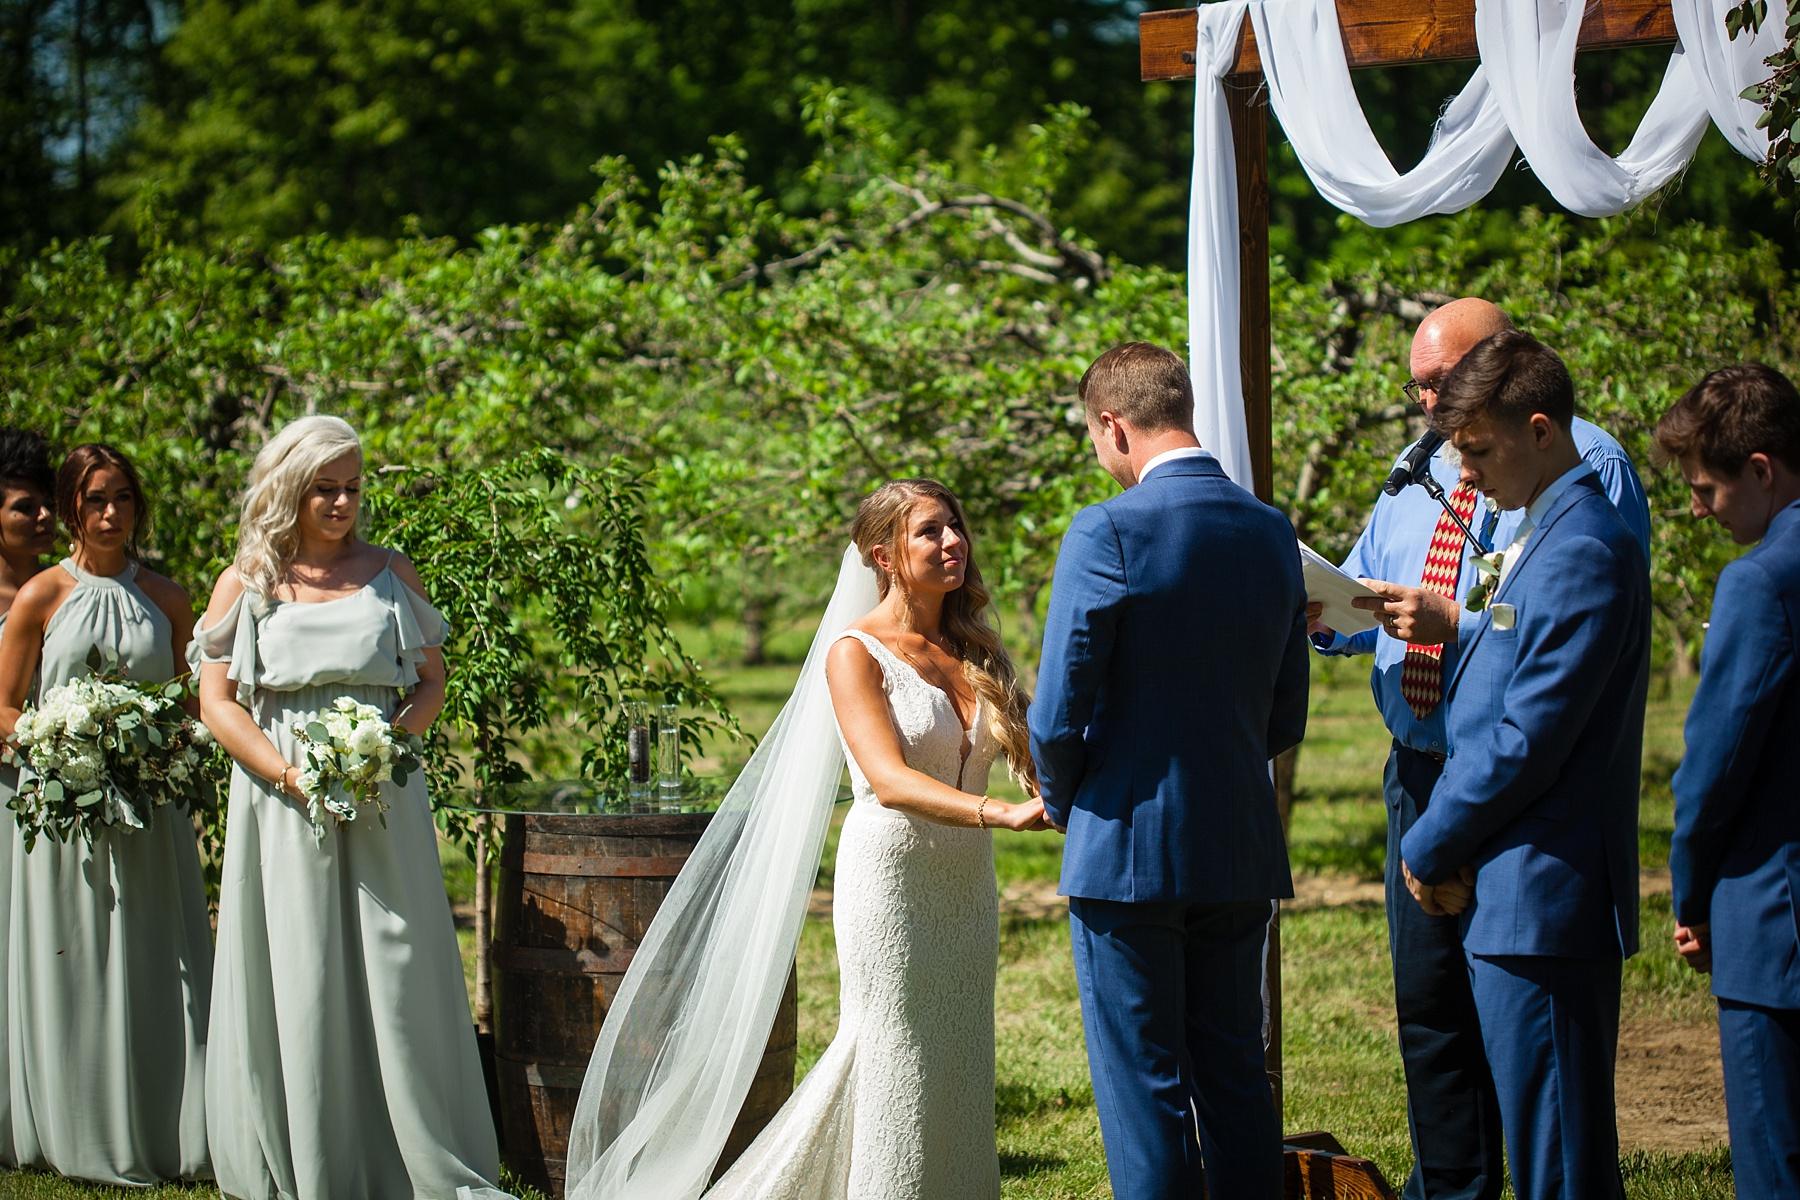 Brandon_Shafer_Photography_Kara_Doug_12_corners_Wedding_Benton_Harbor_0041.jpg